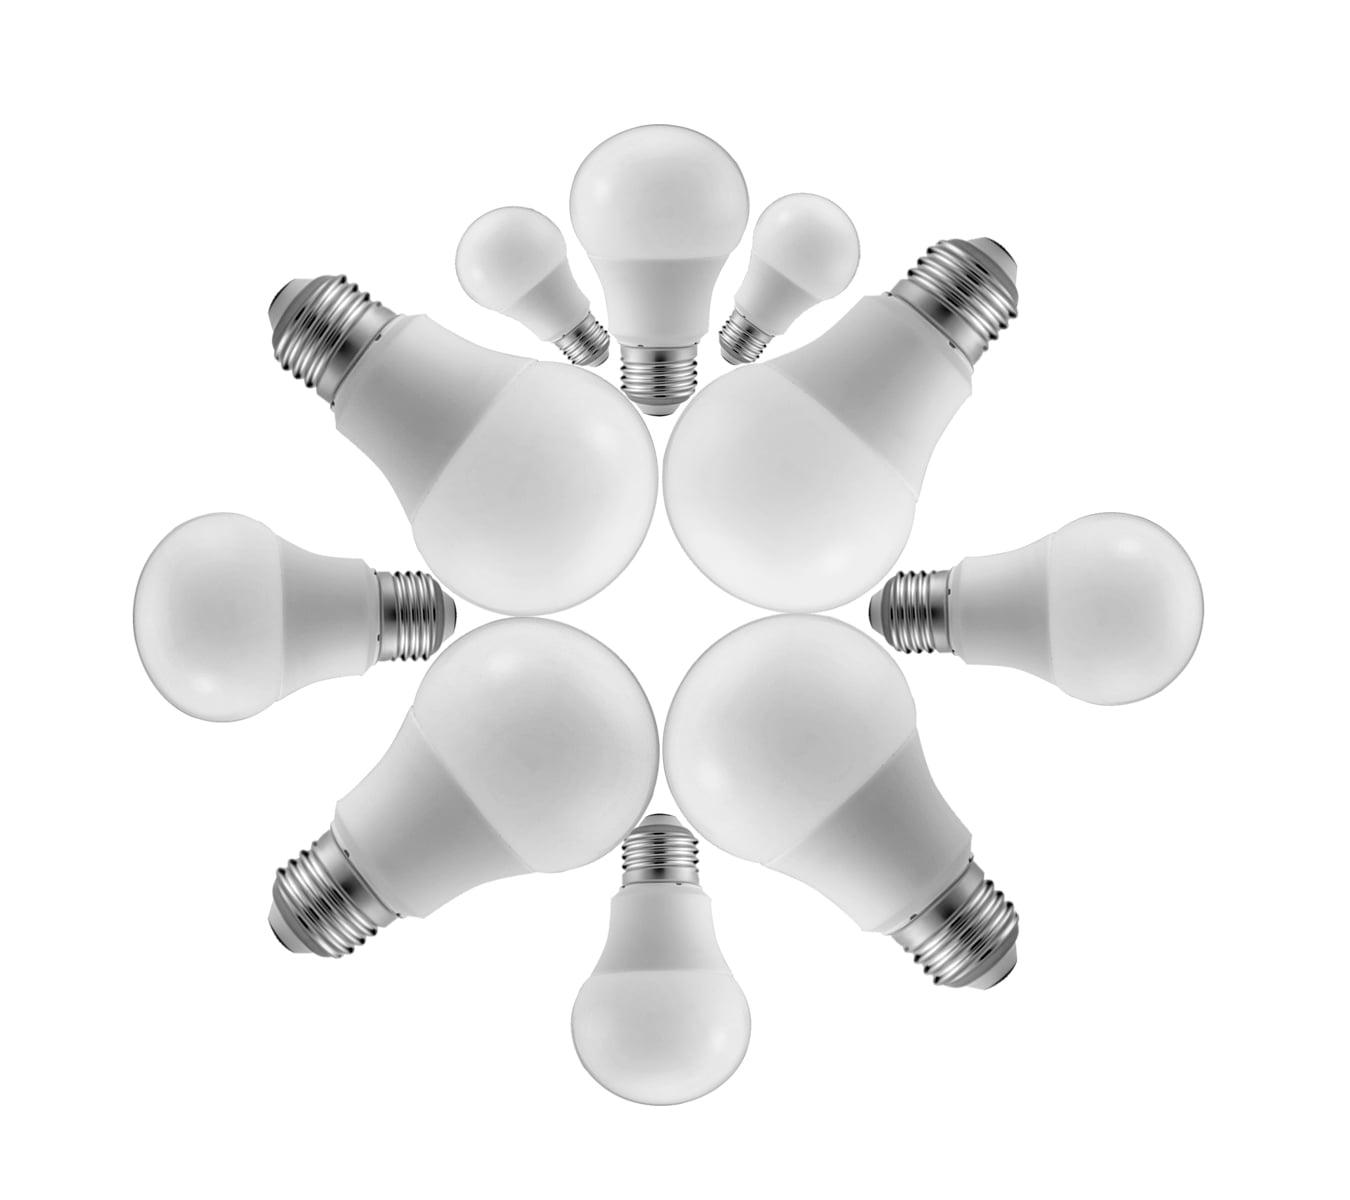 KIT COM 10 LAMPADAS LED BULBO 10W E-27 BIVOLT CERTIFICADA INMETRO